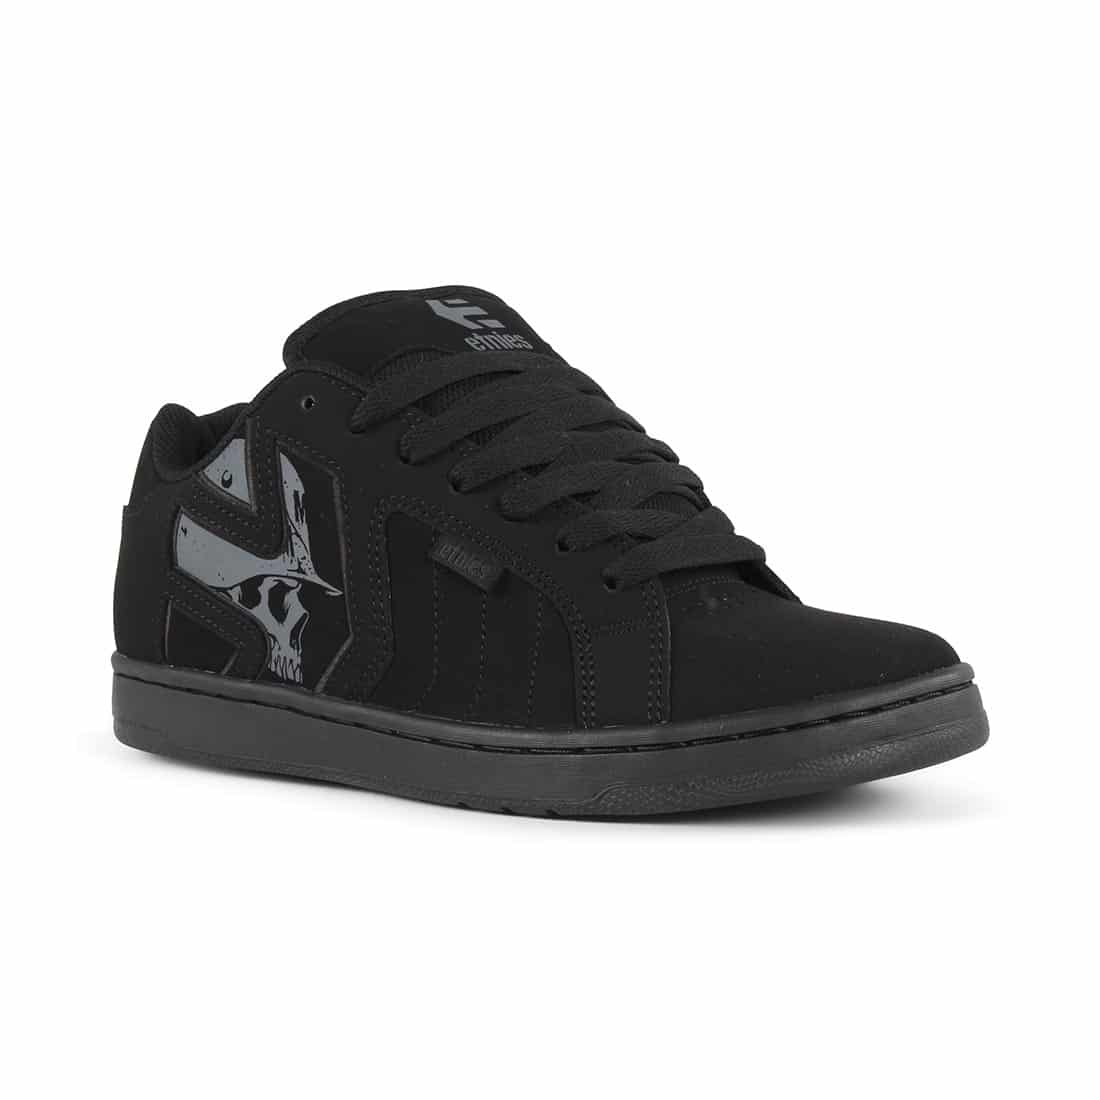 Etnies Metal Mulisha Fader 2 Shoes – Black / Black / Black